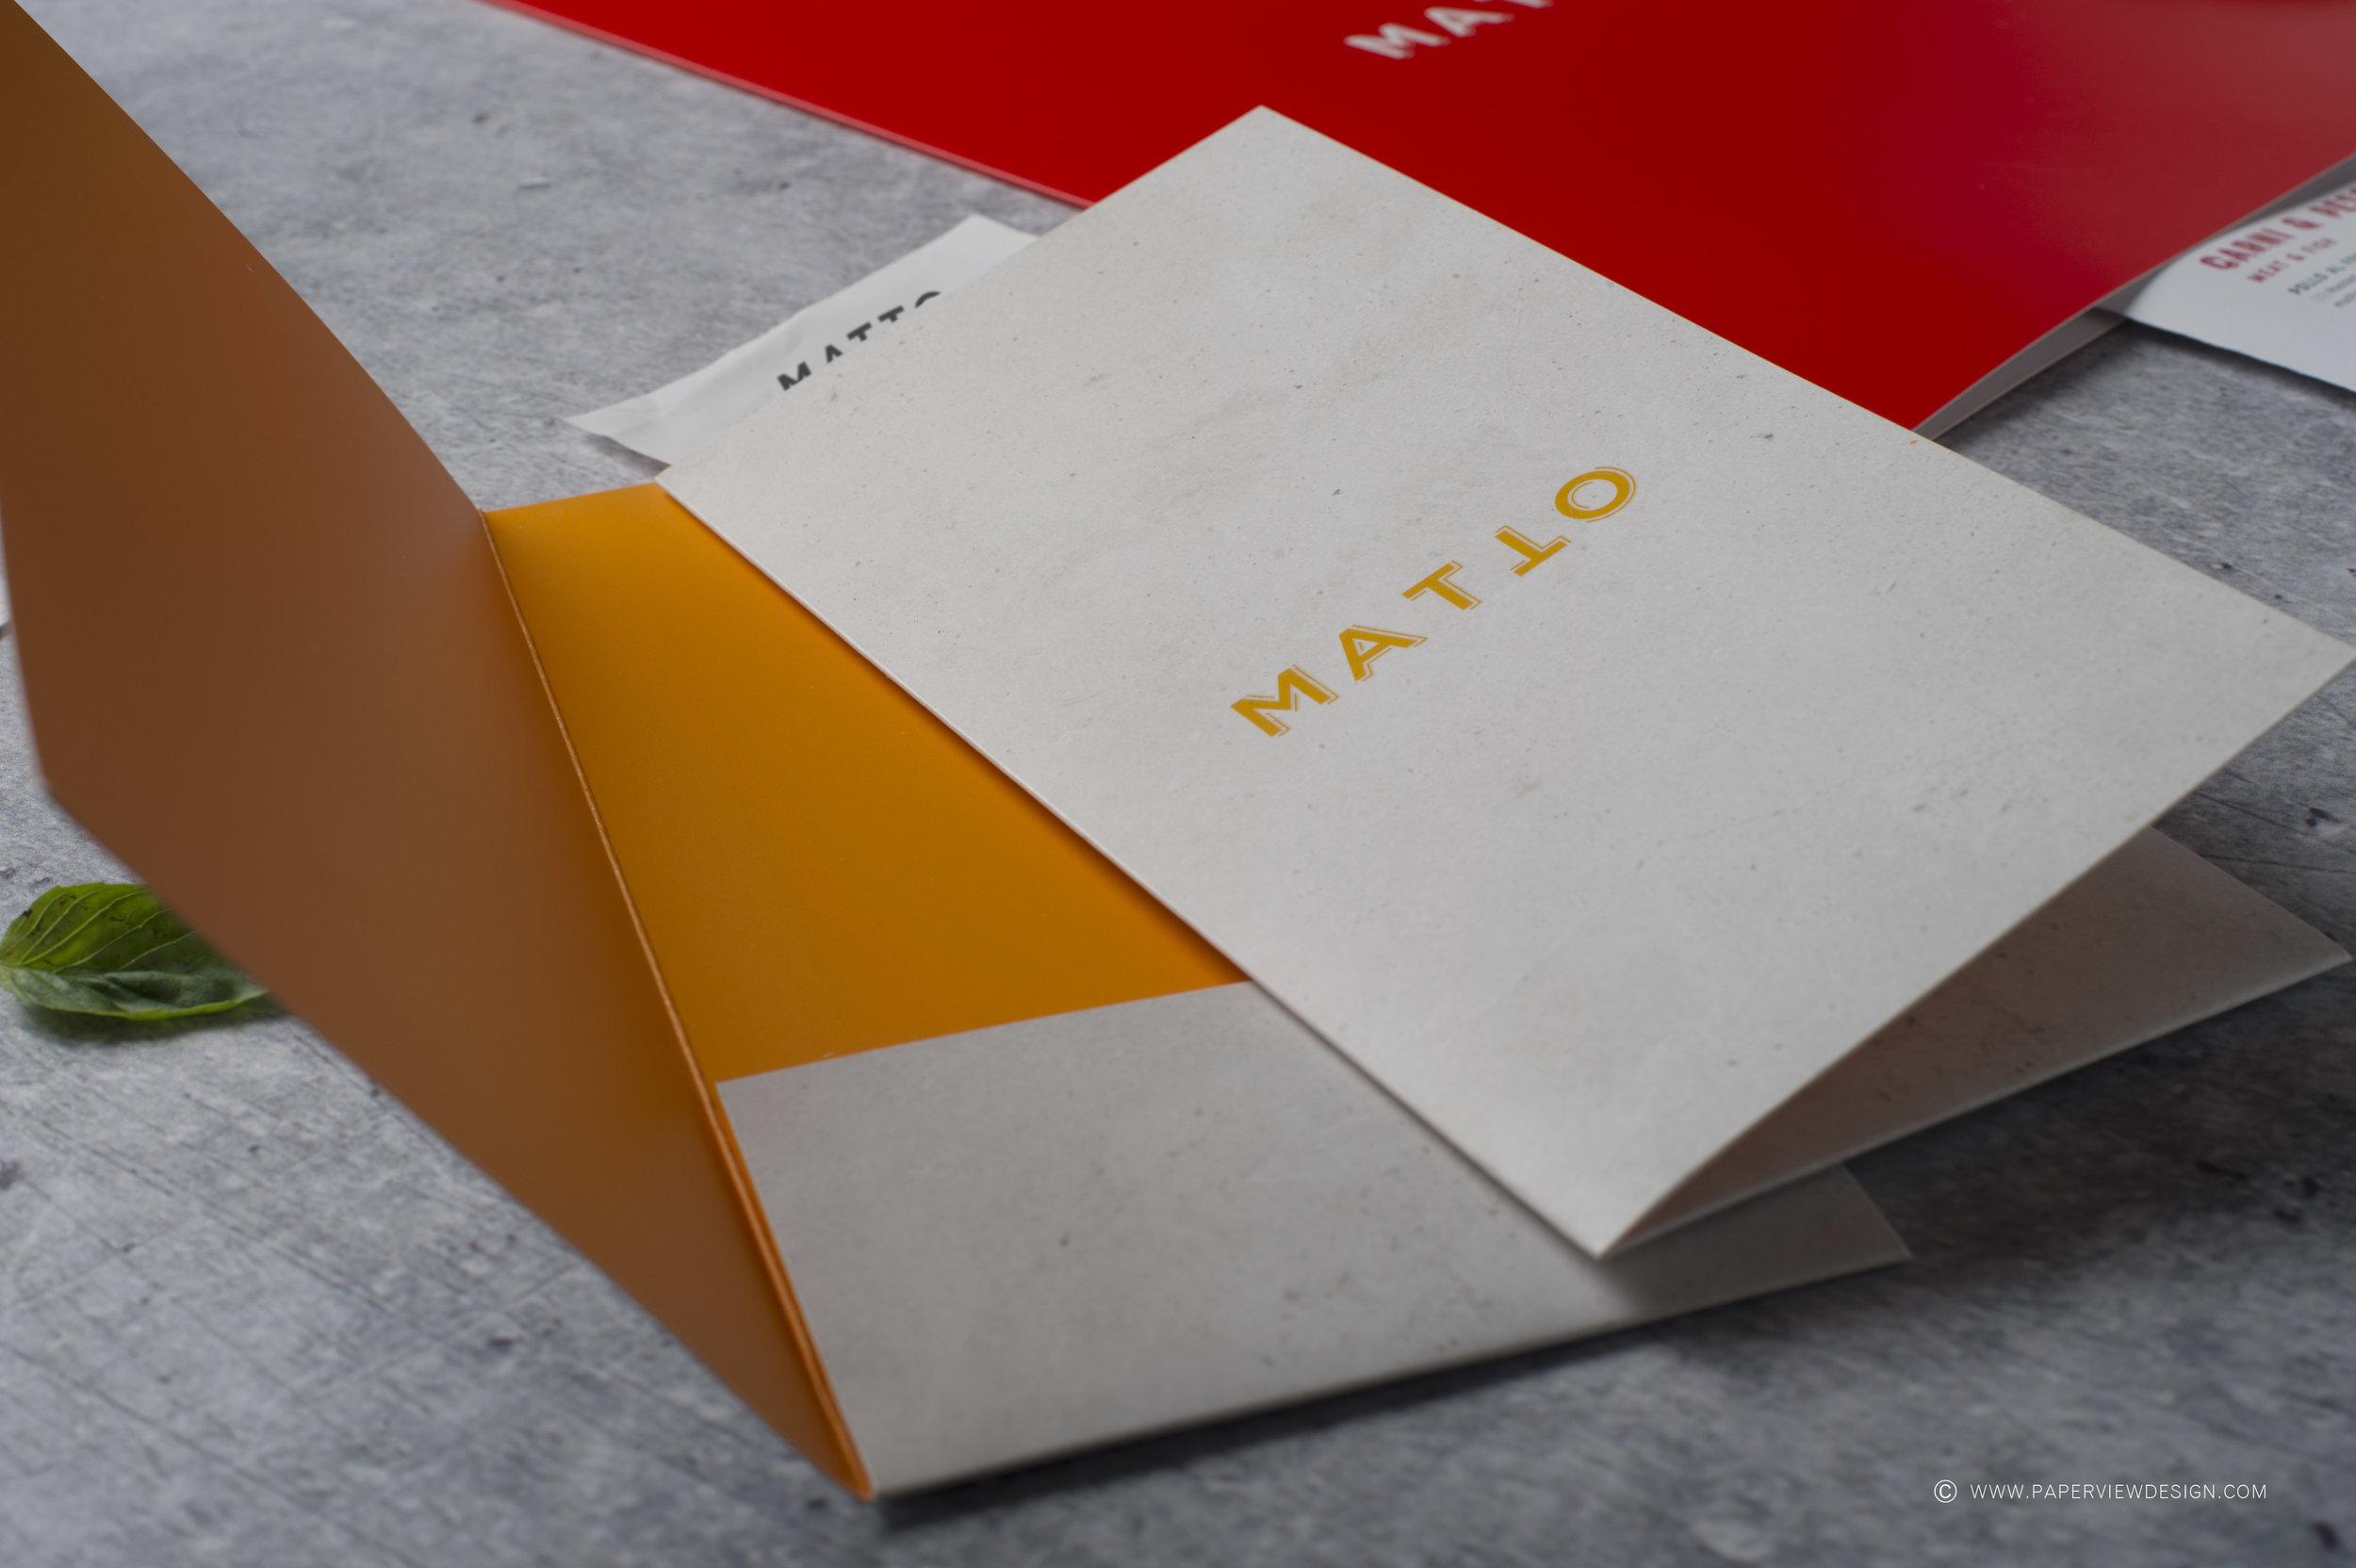 Matto-Crazy-Italian-Kitchen-Design-Bill-Holder-Yellow-Paper